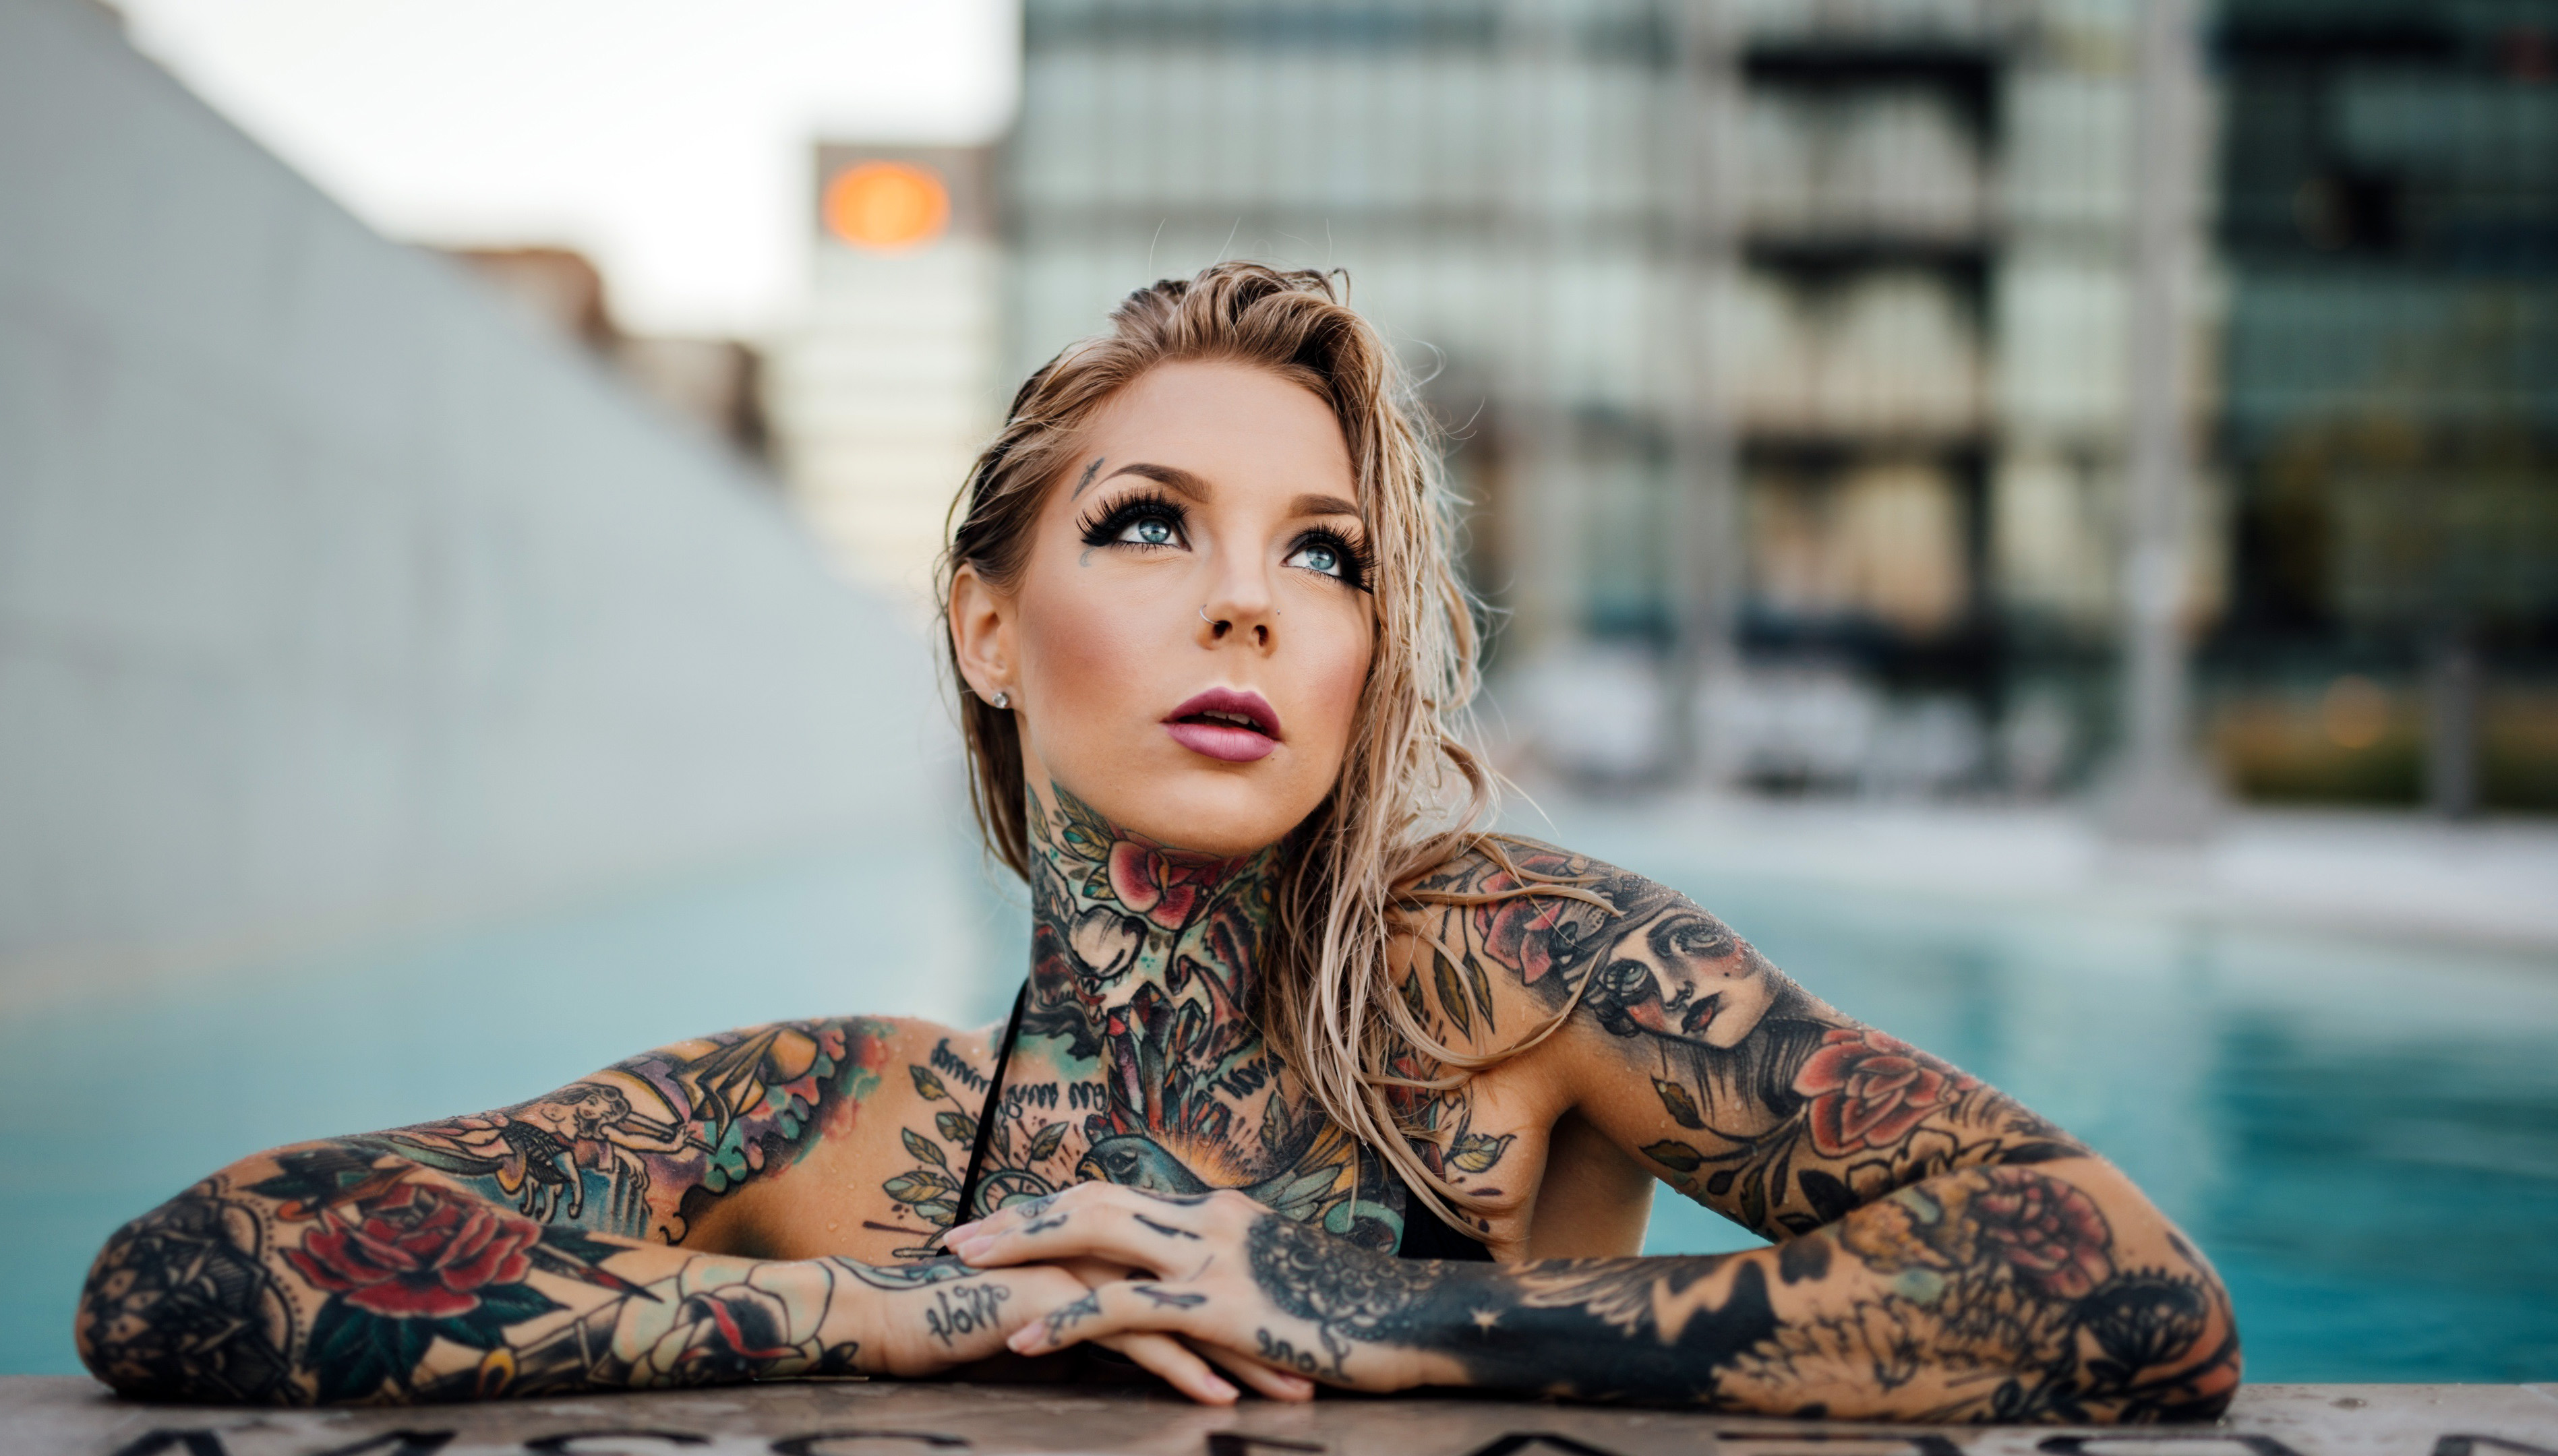 девушка, бассейн, татуировки, Девушки с татуировками обои 4k